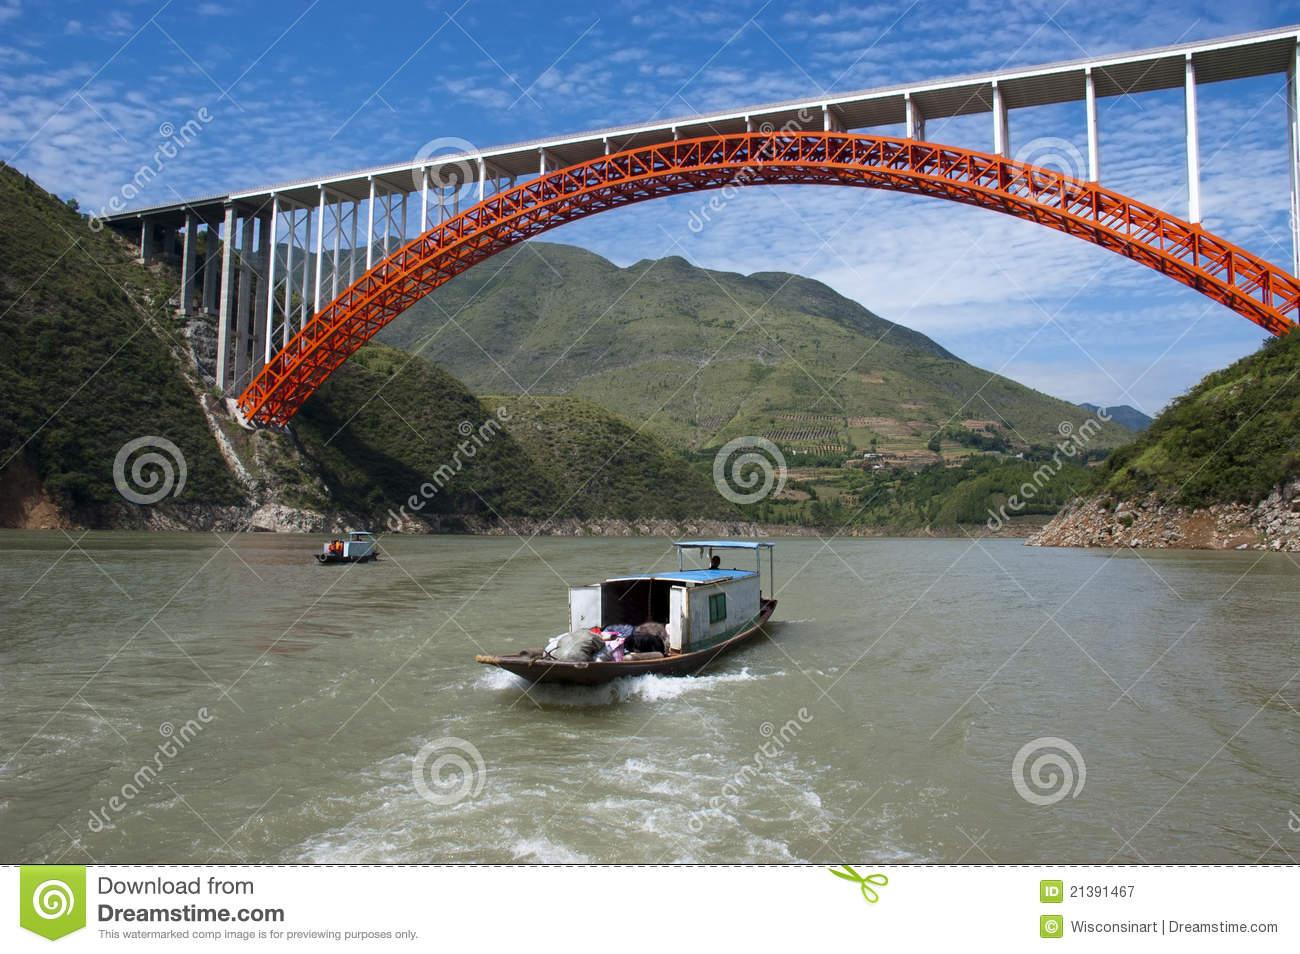 Peapod Water Taxi Boat Yangtze River, China Travel Royalty Free.